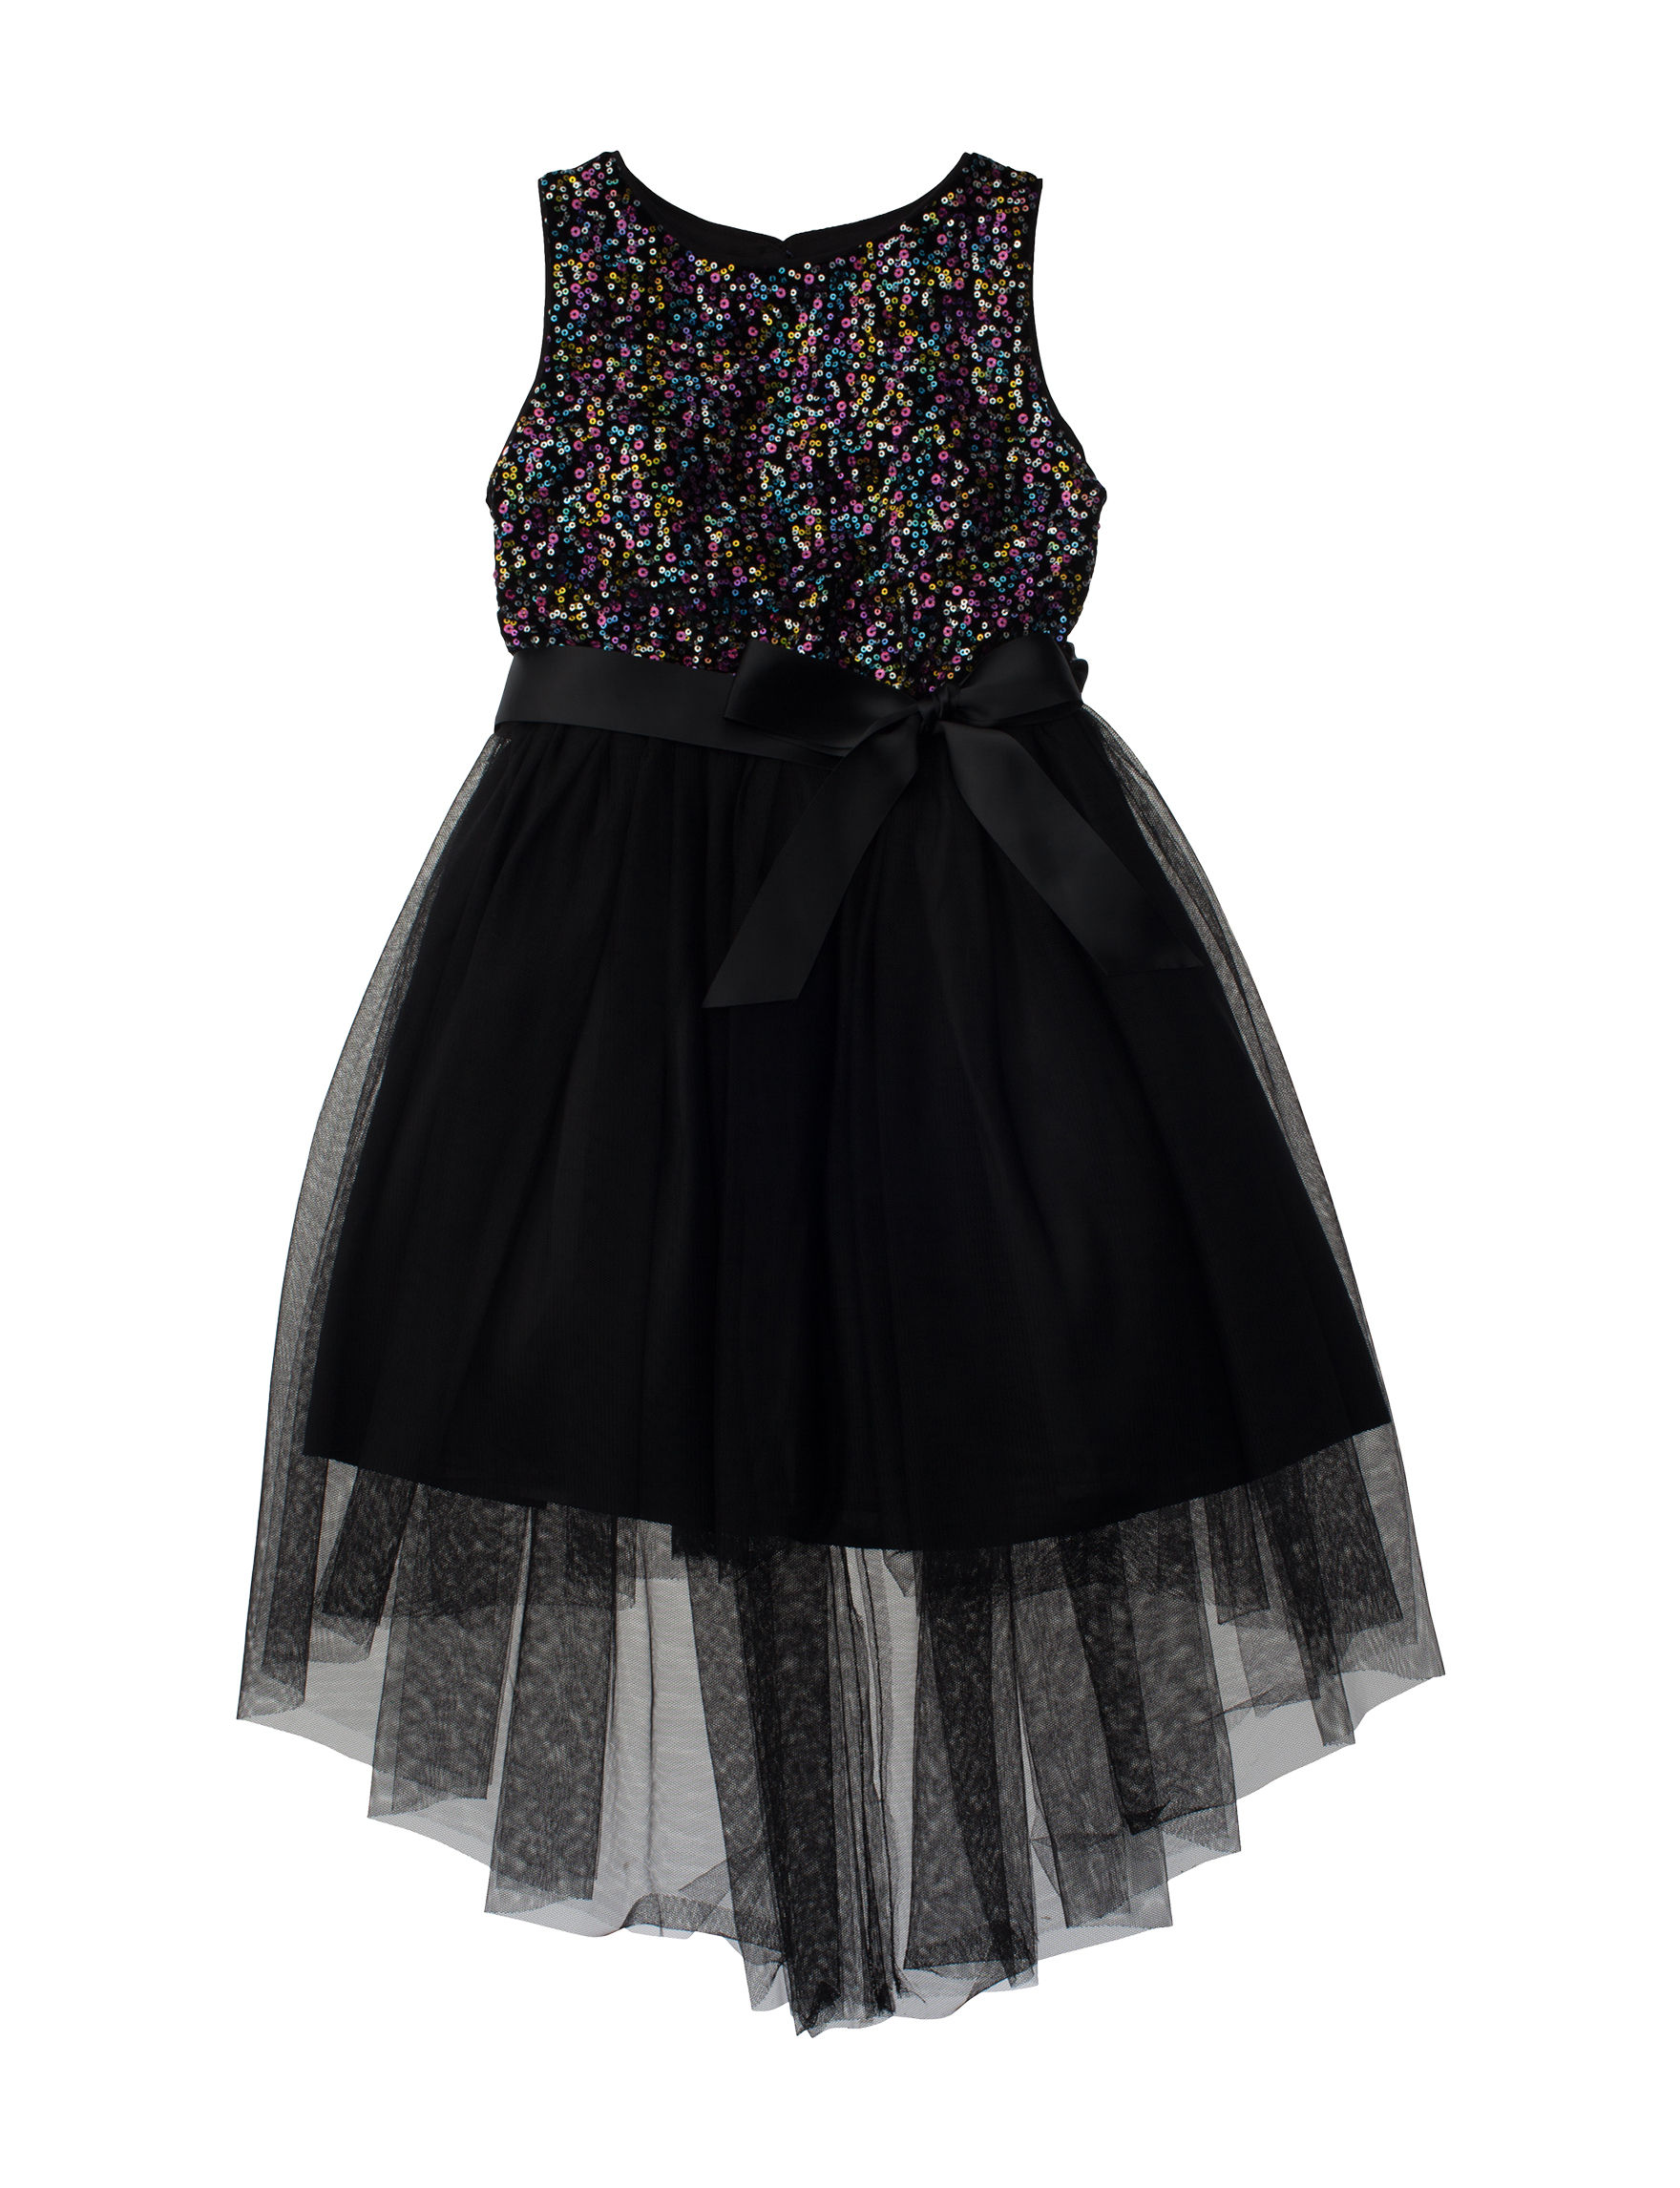 Lilt Black / Sequins